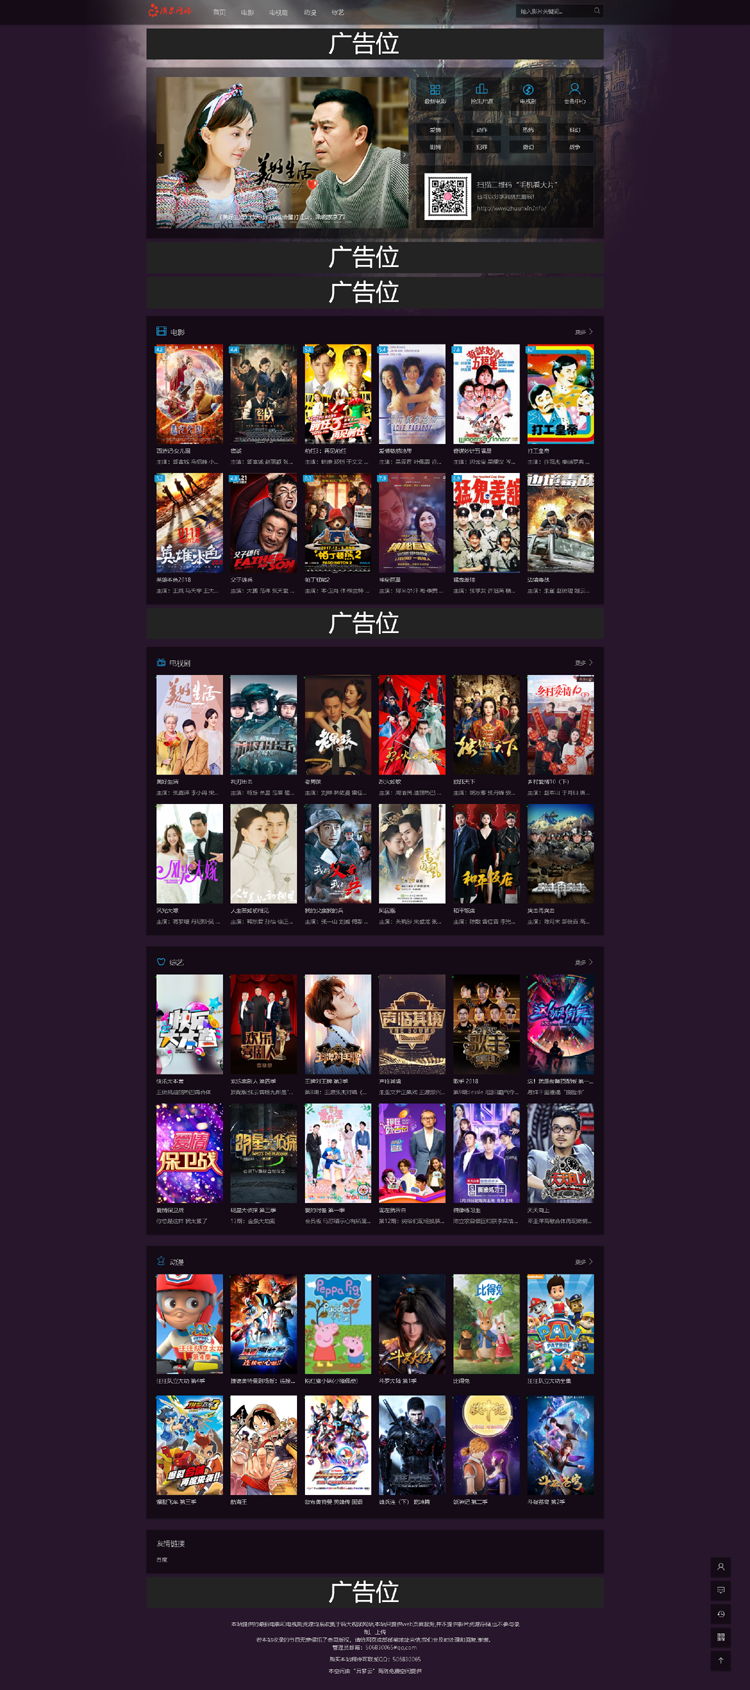 【VIP视频】在线VIP高清电影网站 自动采集各大VIP视频网站源码带广告位